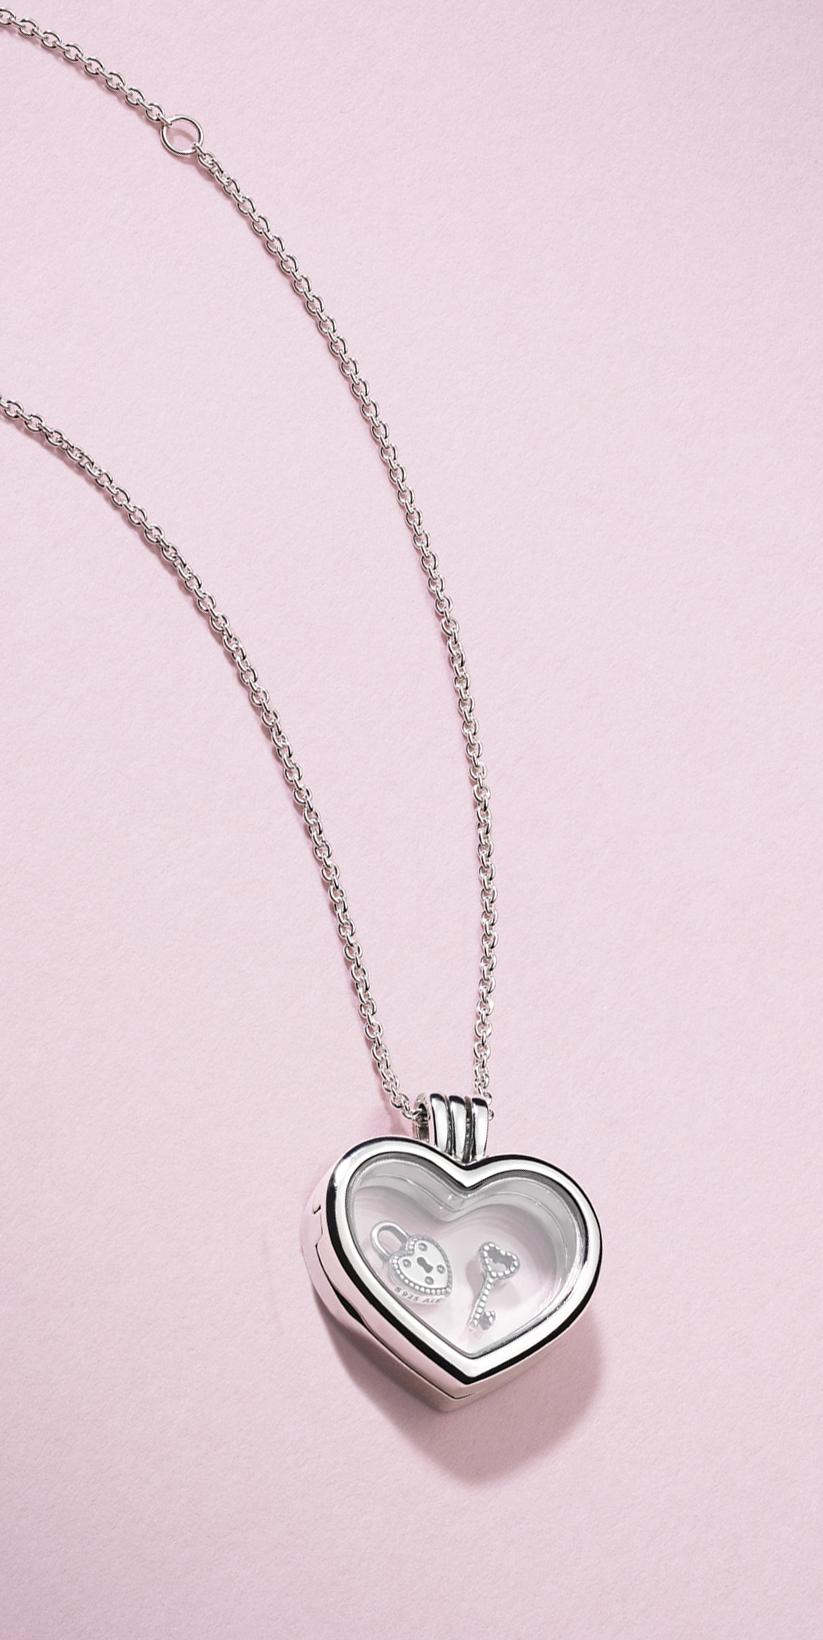 Valentine's Day Jewellery | Pandora Lockets | Pandora Necklace Pertaining To Most Recent Pandora Lockets Logo Dangle Charm Necklaces (View 3 of 25)